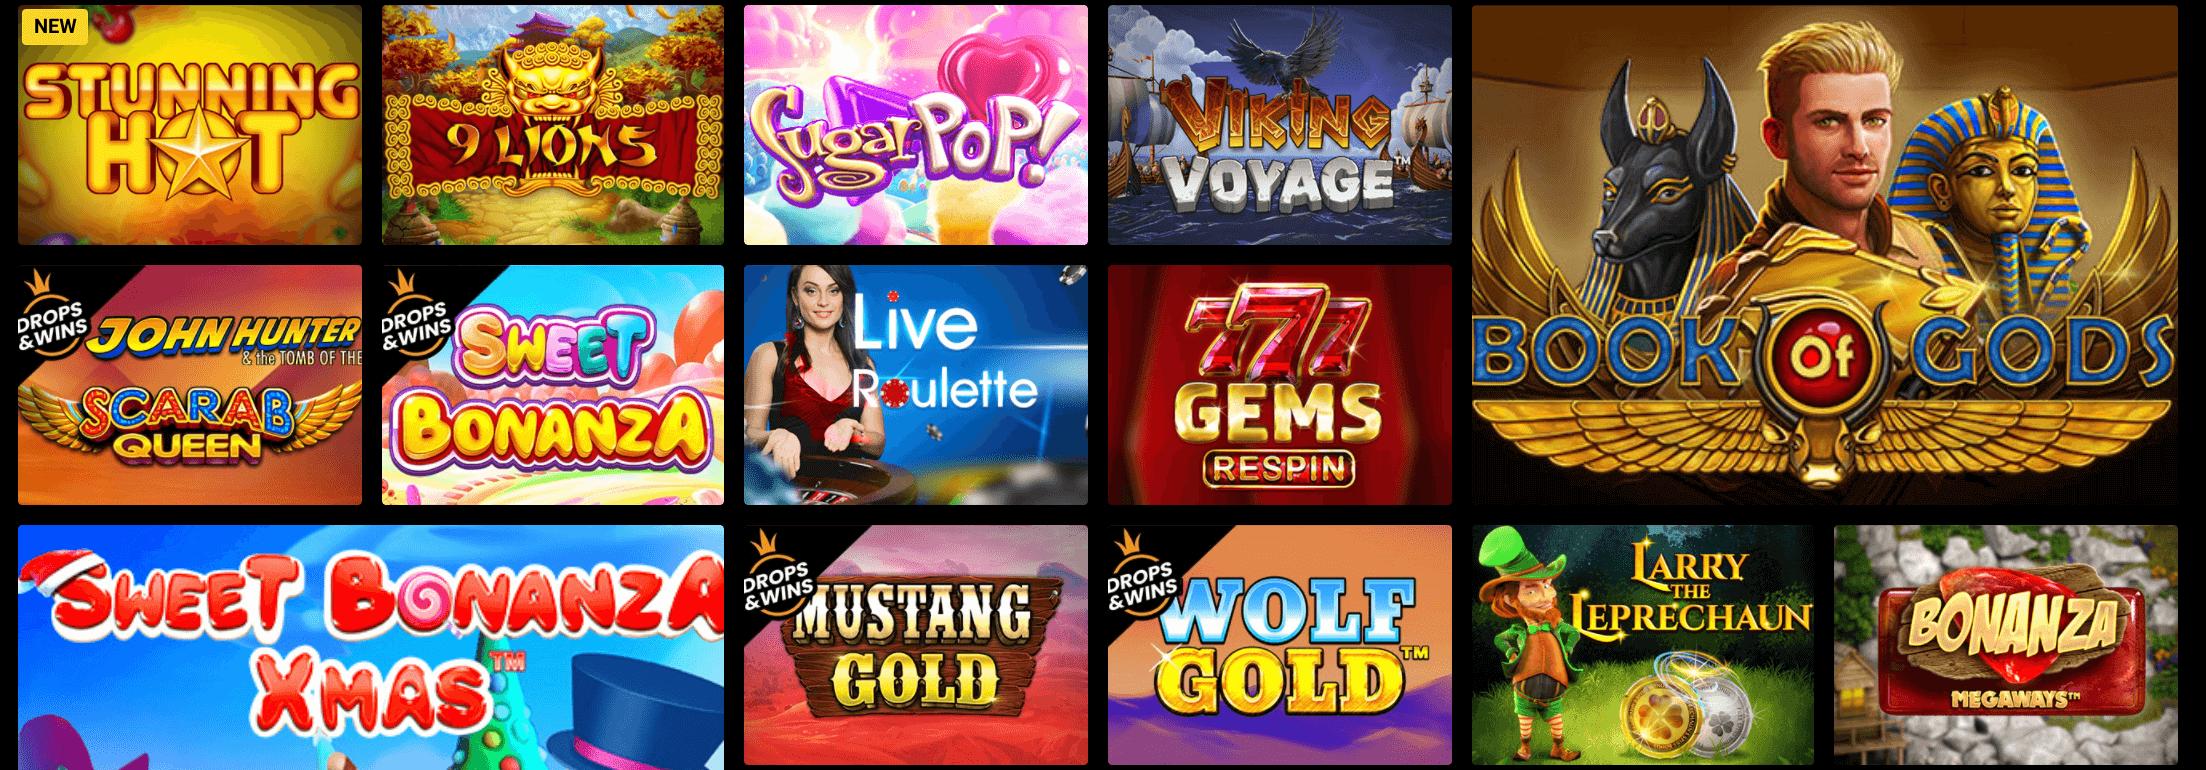 Online Slot Machine Rules